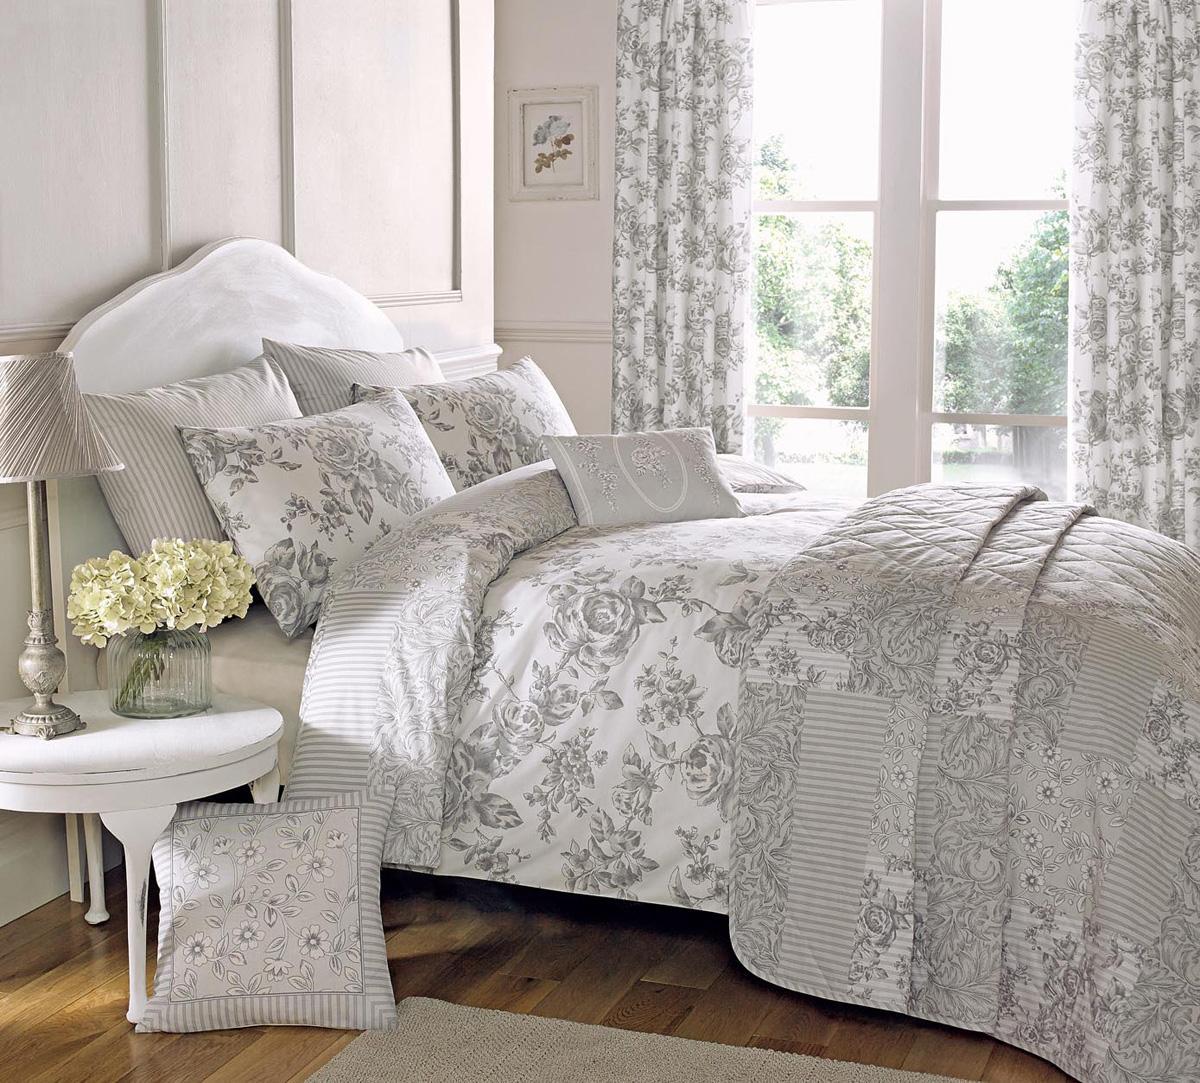 malton bedding set in slate  free uk delivery  terrys fabrics - malton bedding set